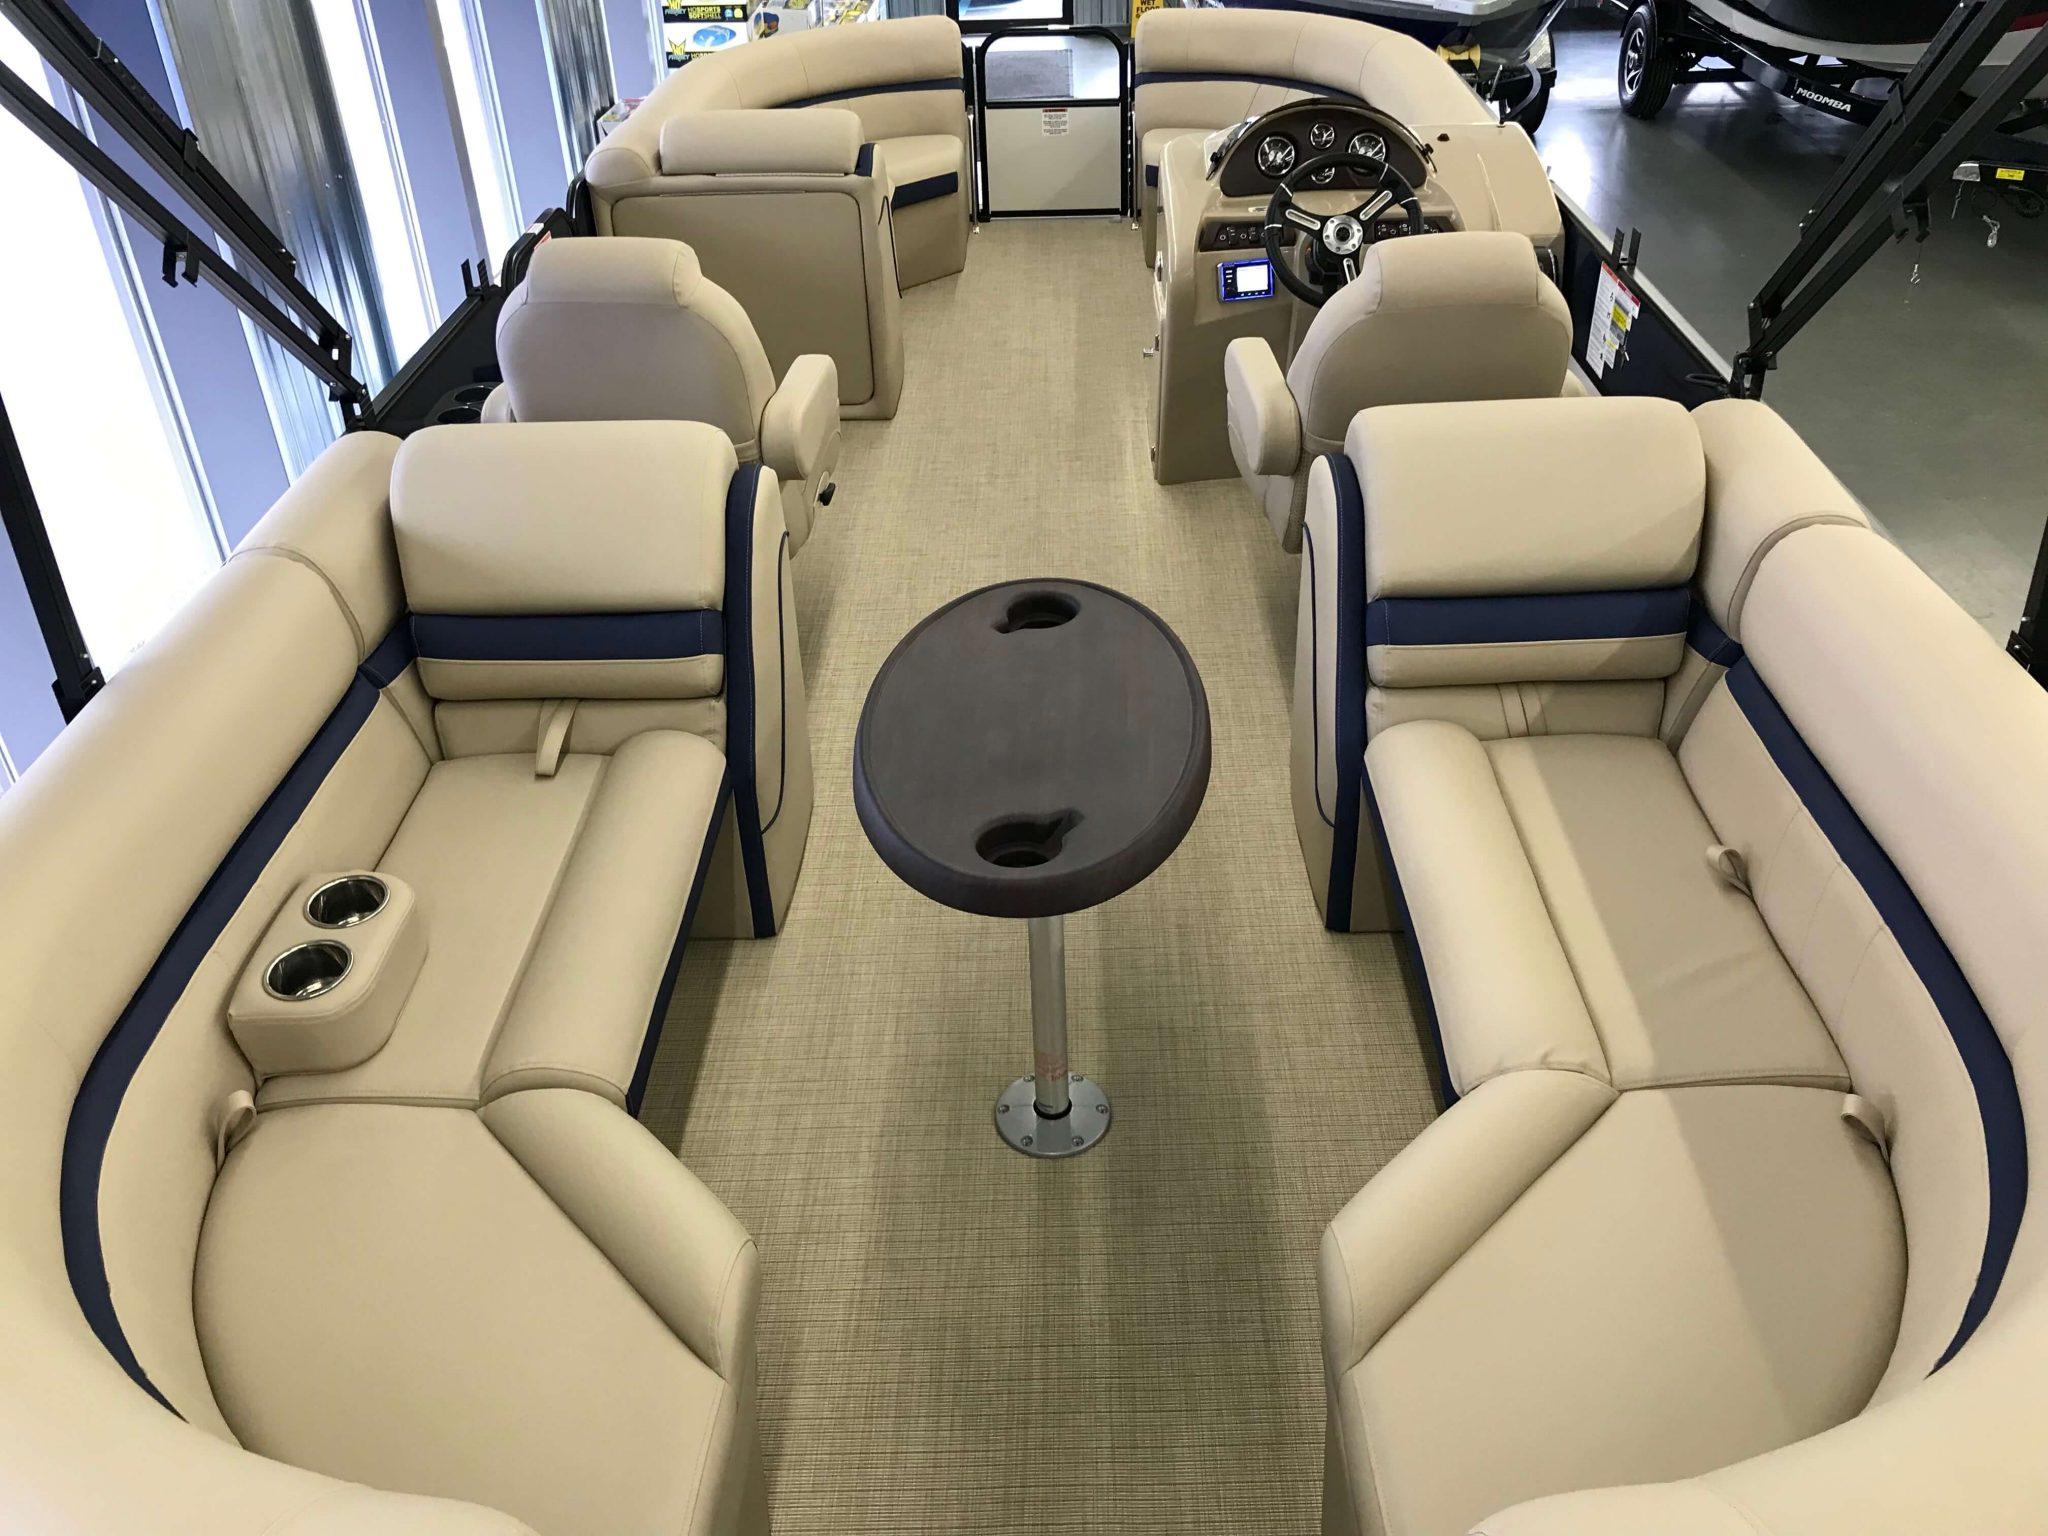 2019 Berkshire 24RFX CTS 3.0 Tritoon Interior Cockpit Layout 1